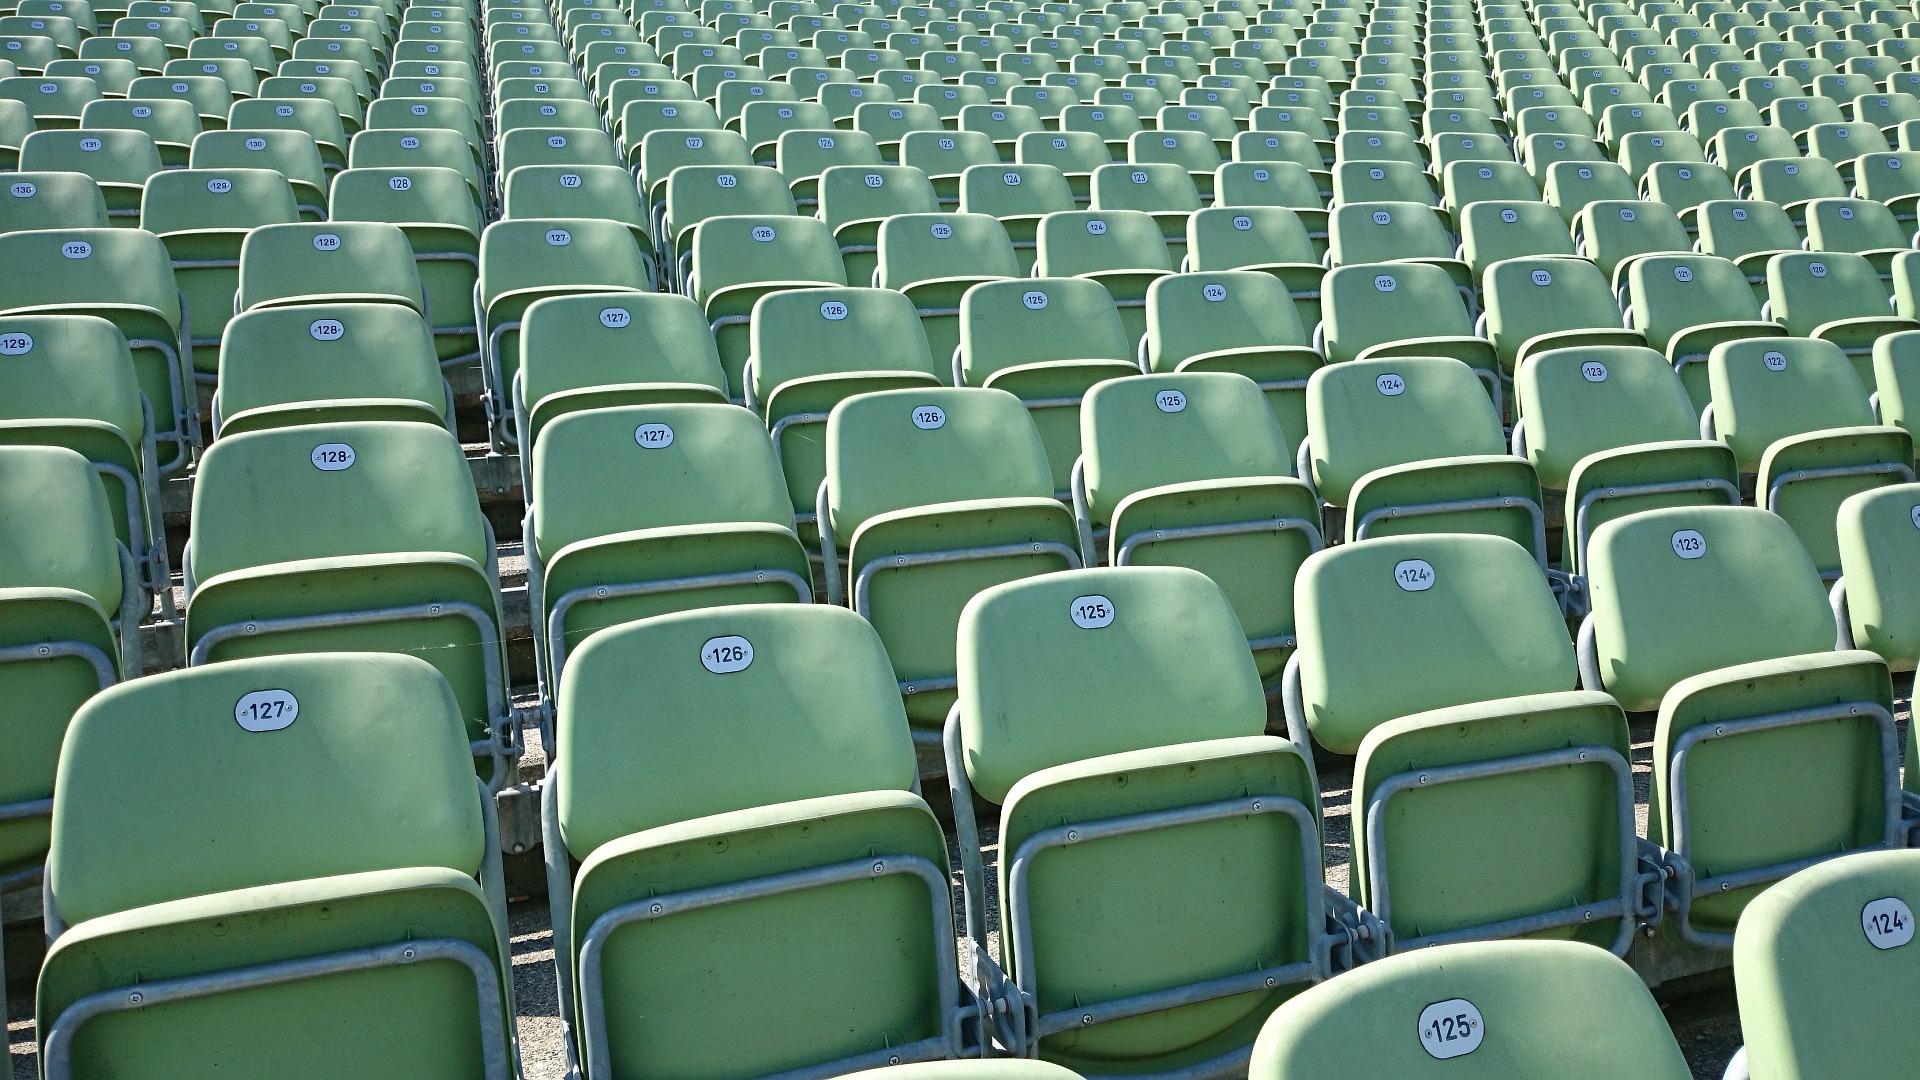 grandstand-334476_1920